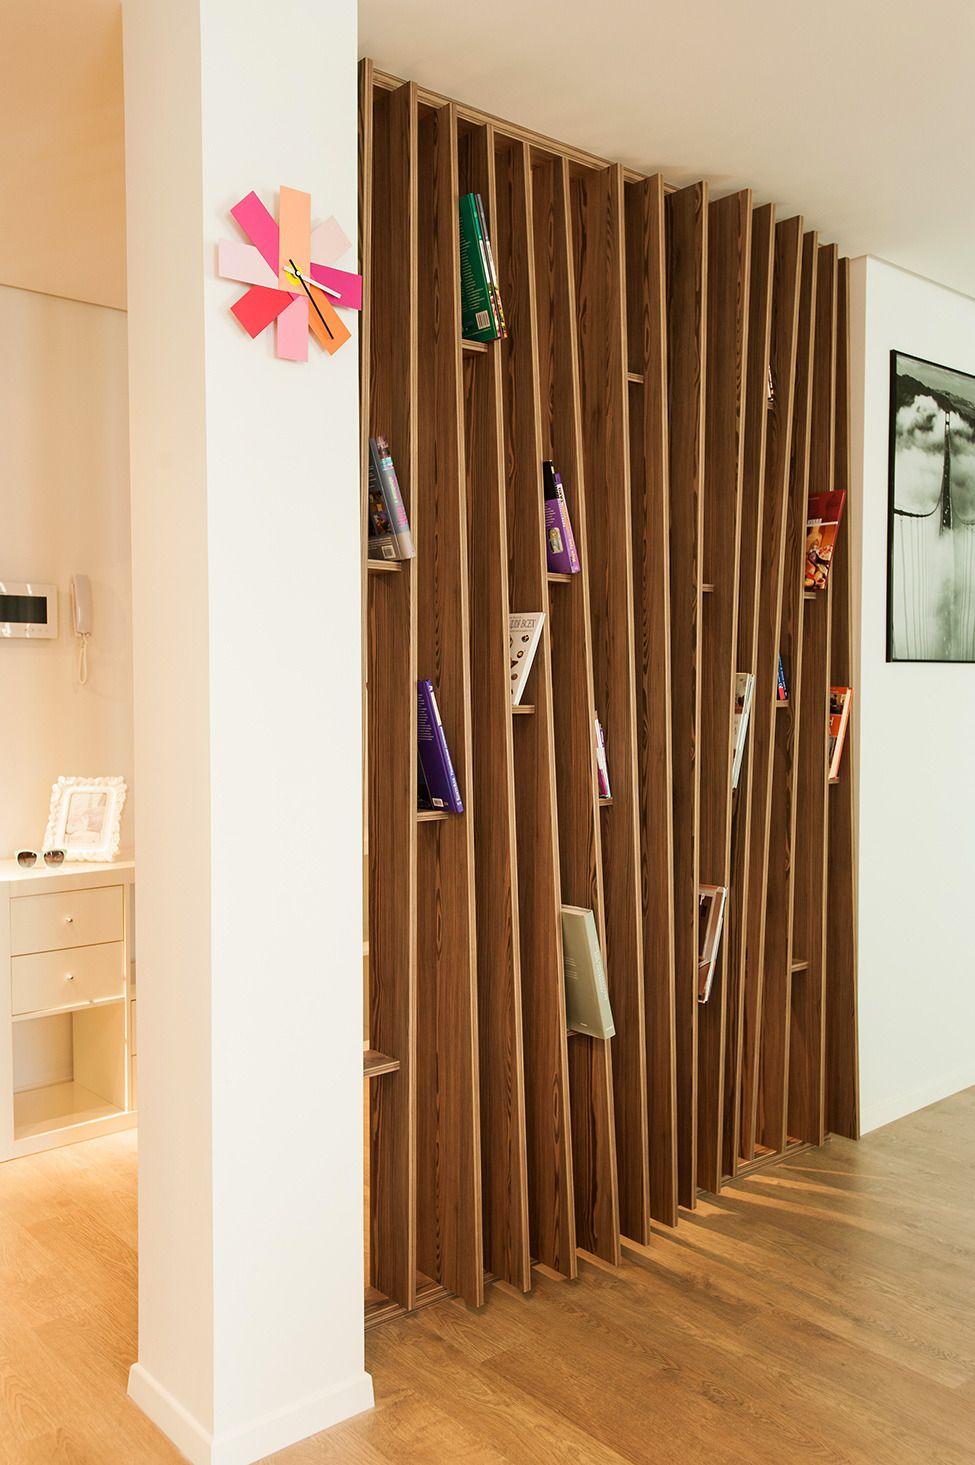 Уютная квартирастудия в Одессе divider shelves and interiors